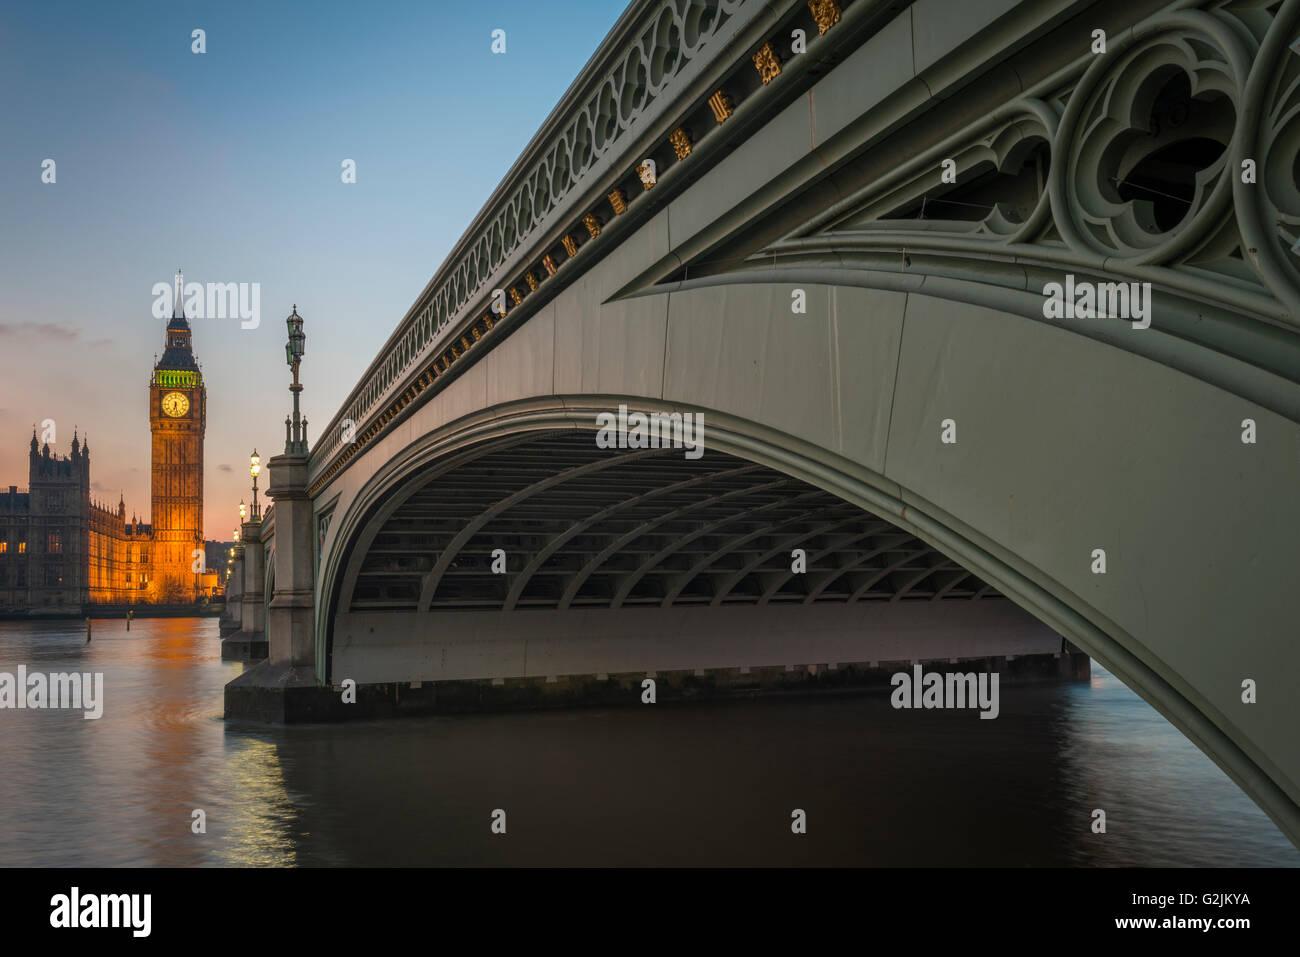 The Big Ben and Westminster Bridge at Night,London,UK - Stock Image